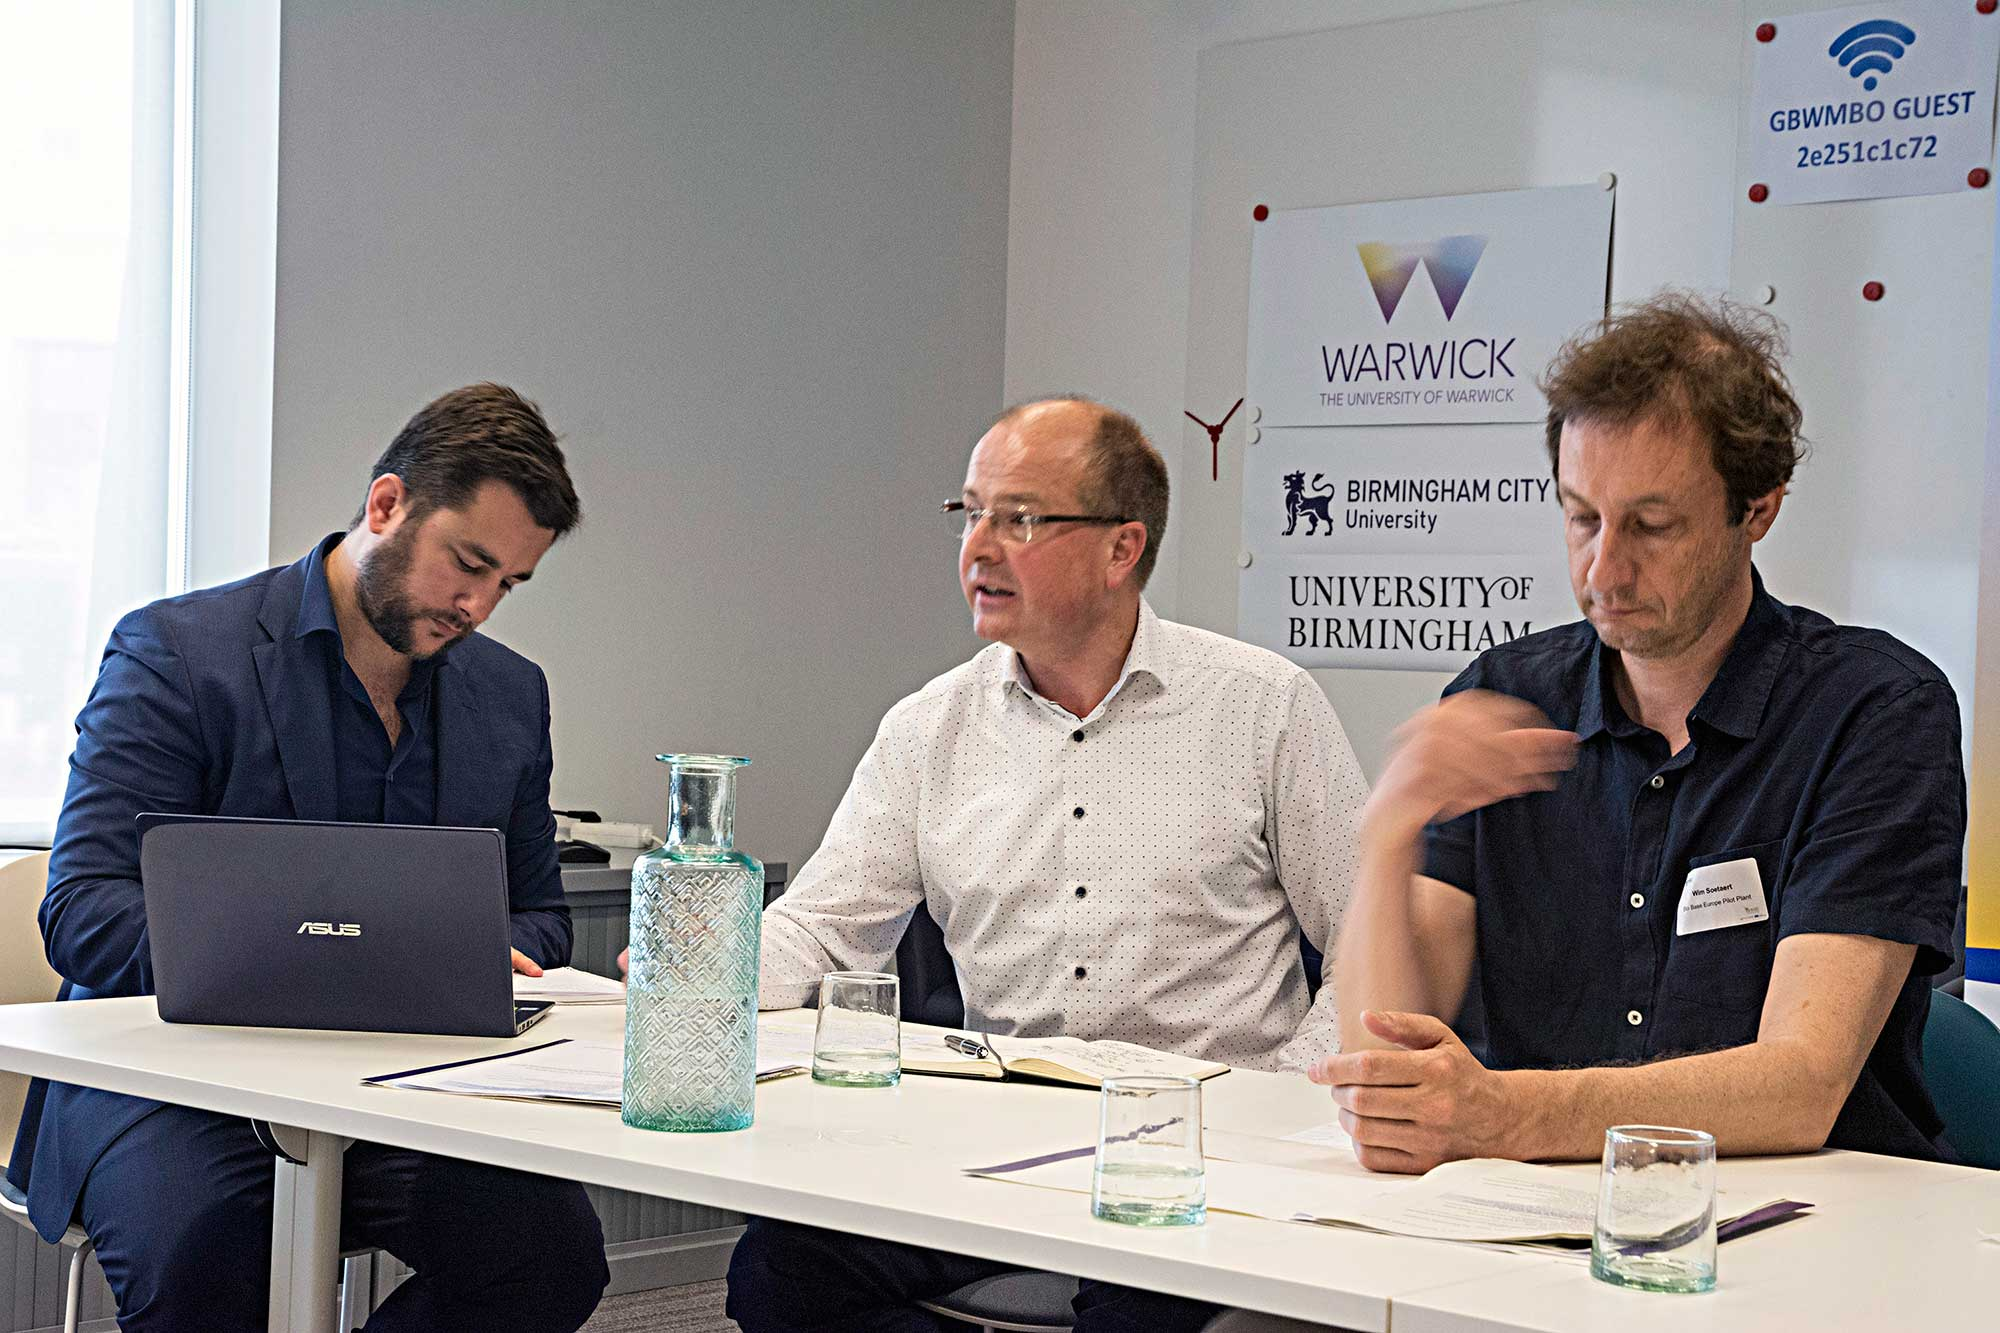 Pierre Padilla, Eric Goossens and Wim Soetaert